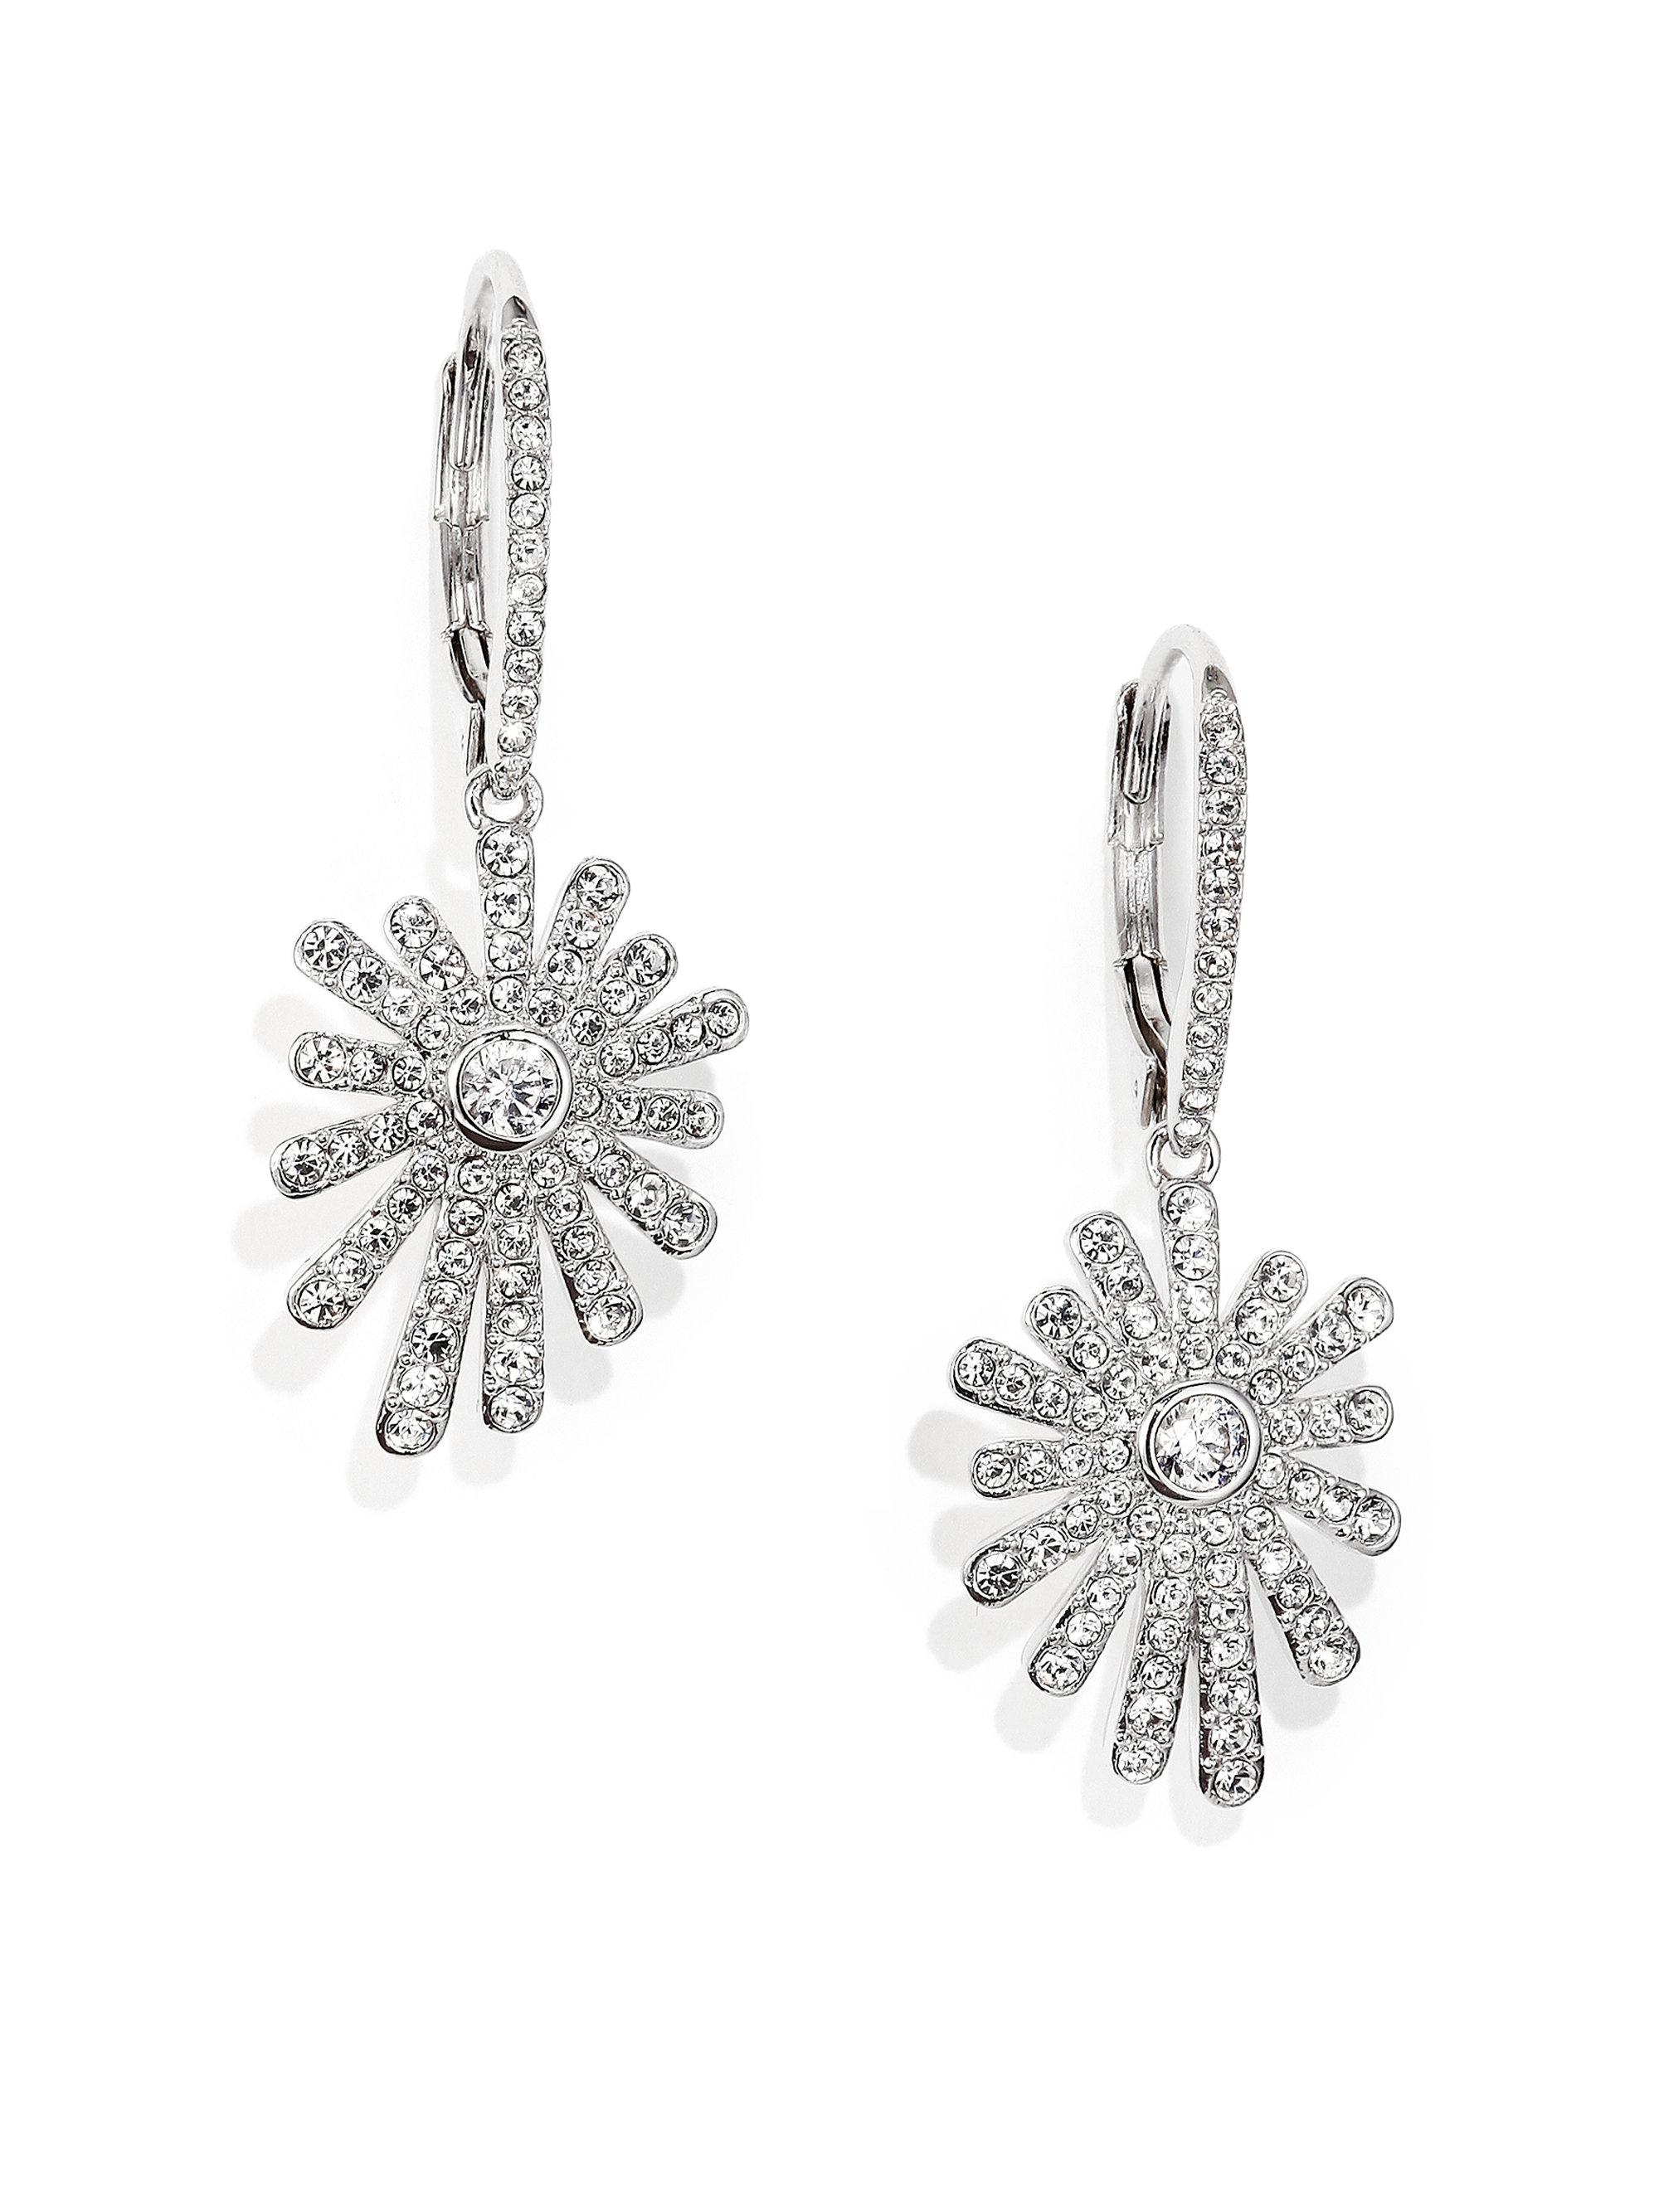 Adriana orsini Starburst Leverback Drop Earrings in Metallic